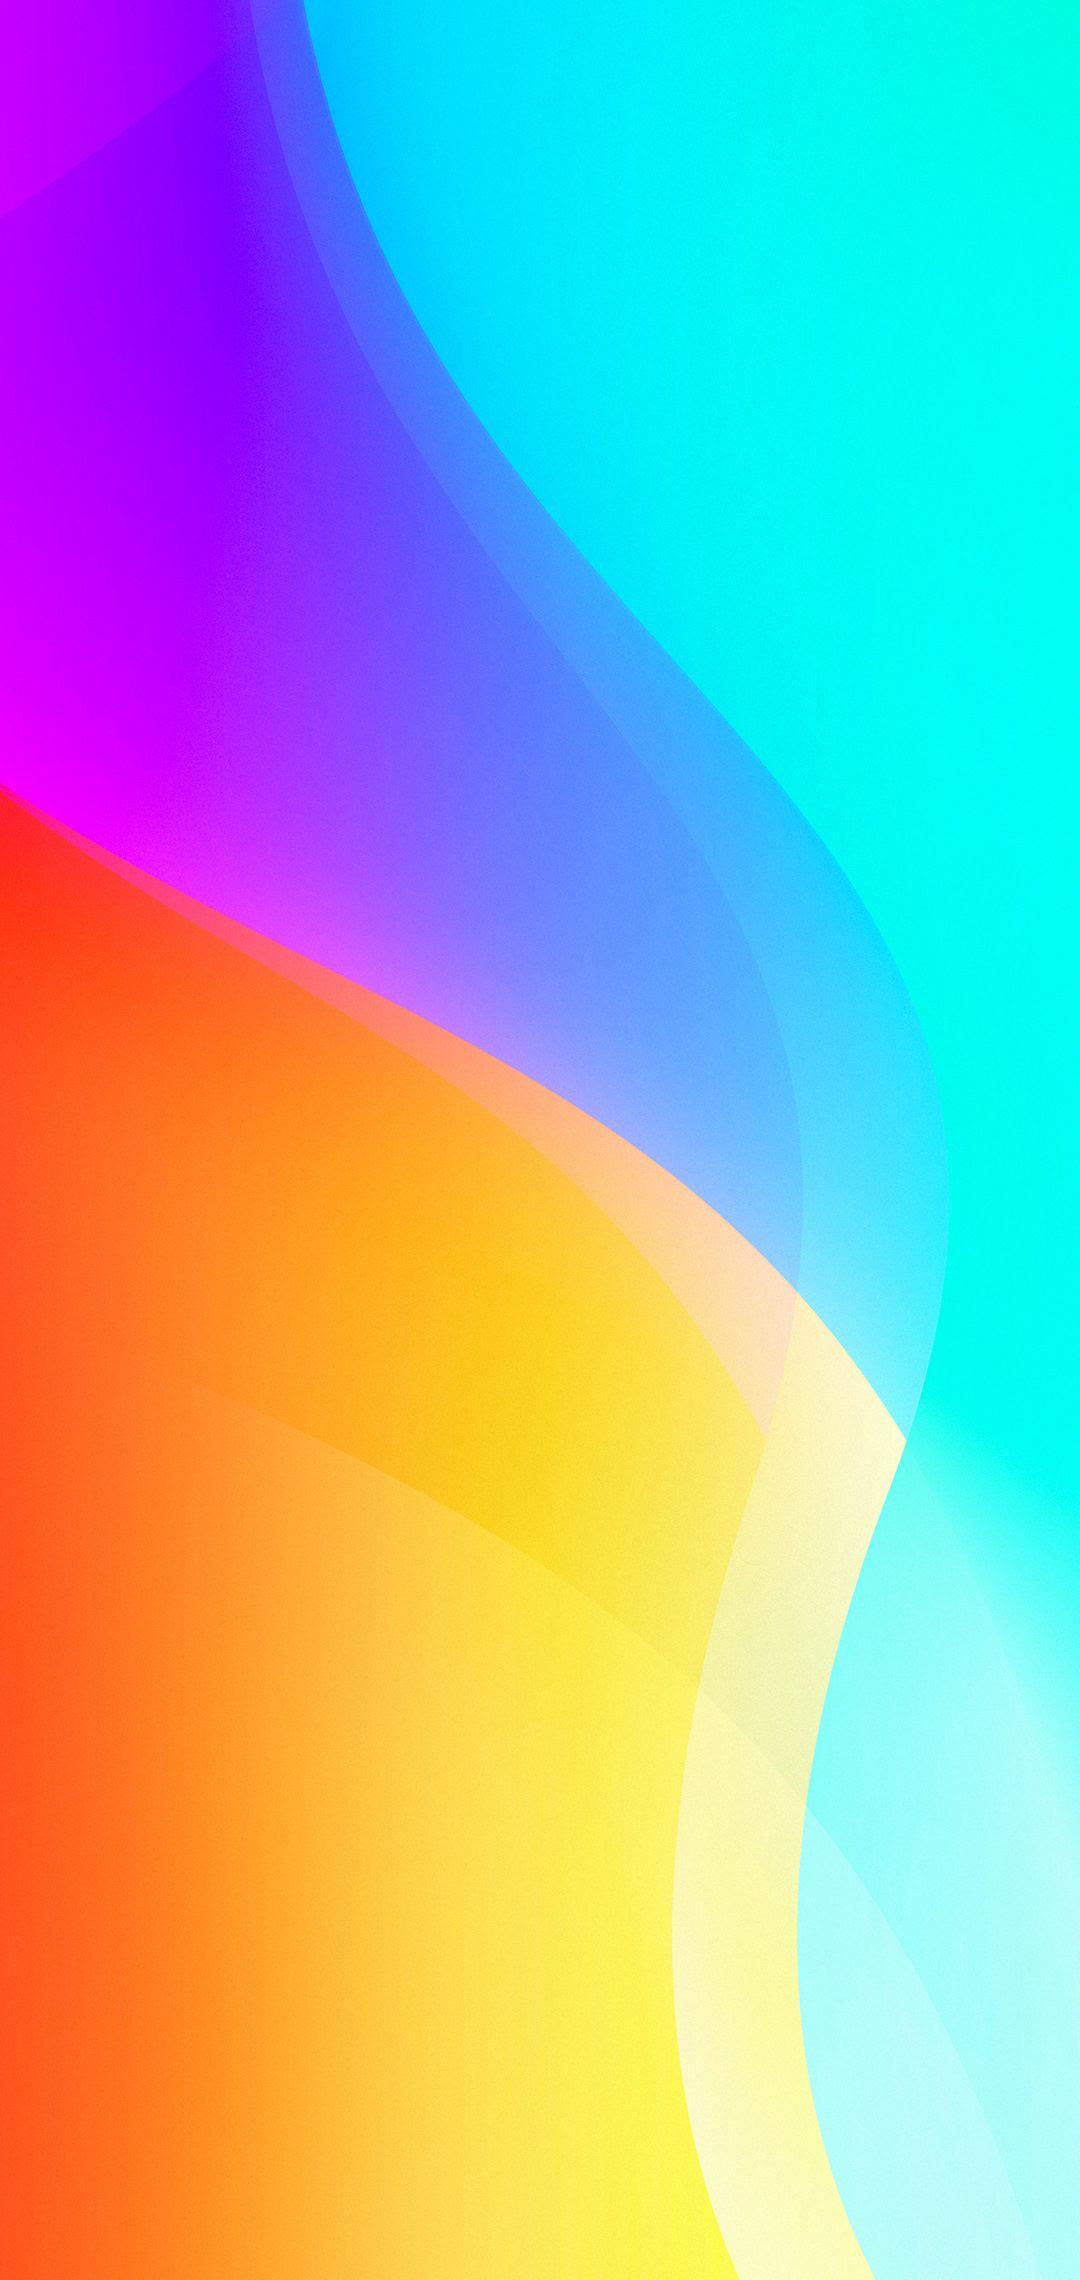 download_vivo_v11_wallpapers (1)